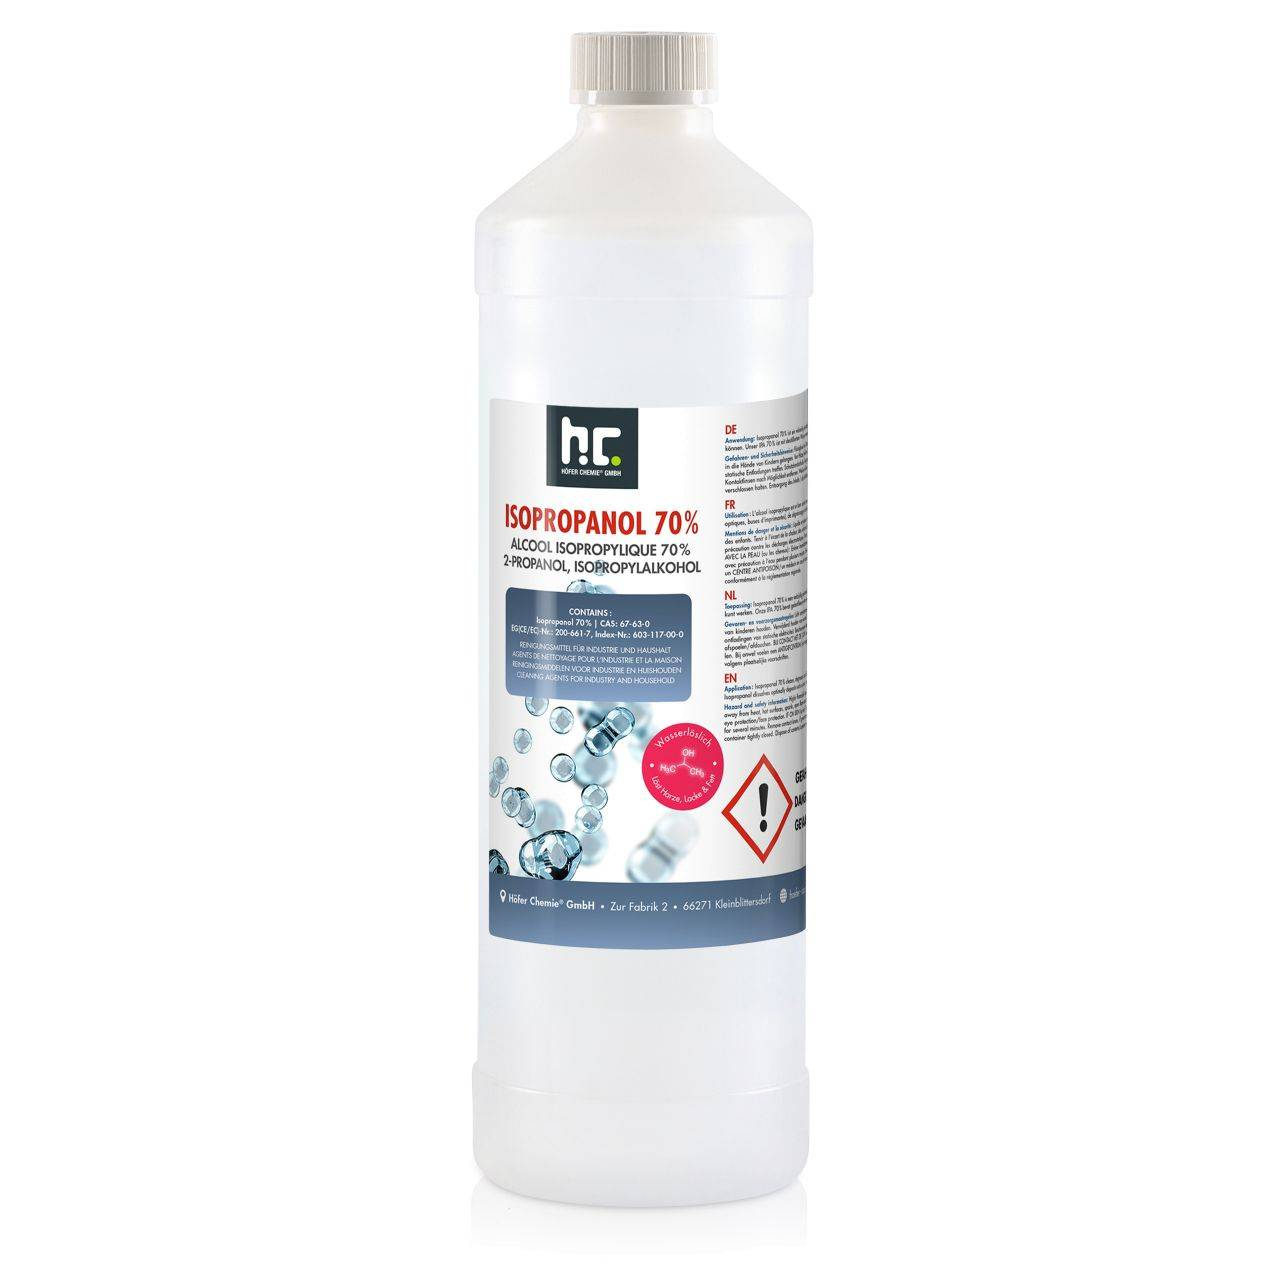 Höfer Chemie 1 l alcool isopropylique 70% (1 x 1 l)